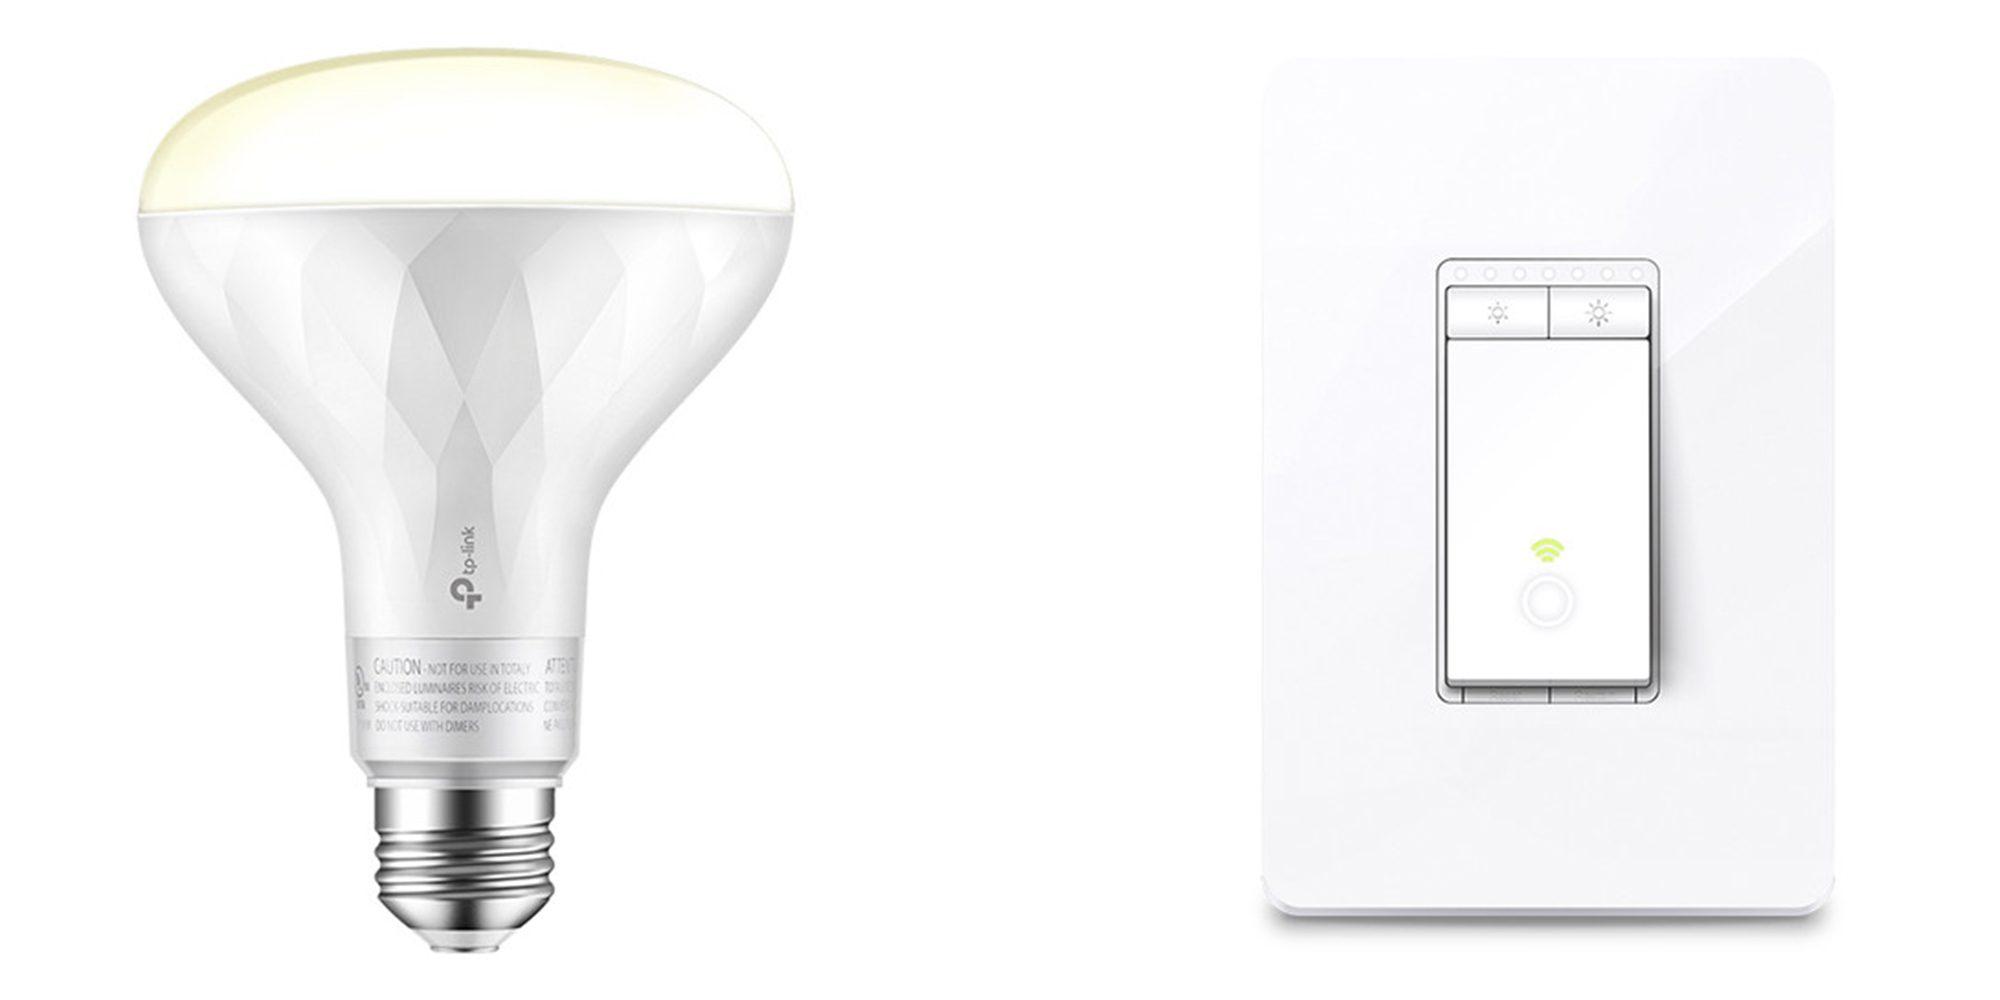 9to5Toys Mittagspause: Acer Chromebook 14 239 $, Google Home Hub 87 $, TP-Link Smart Lighting 30 $, mehr